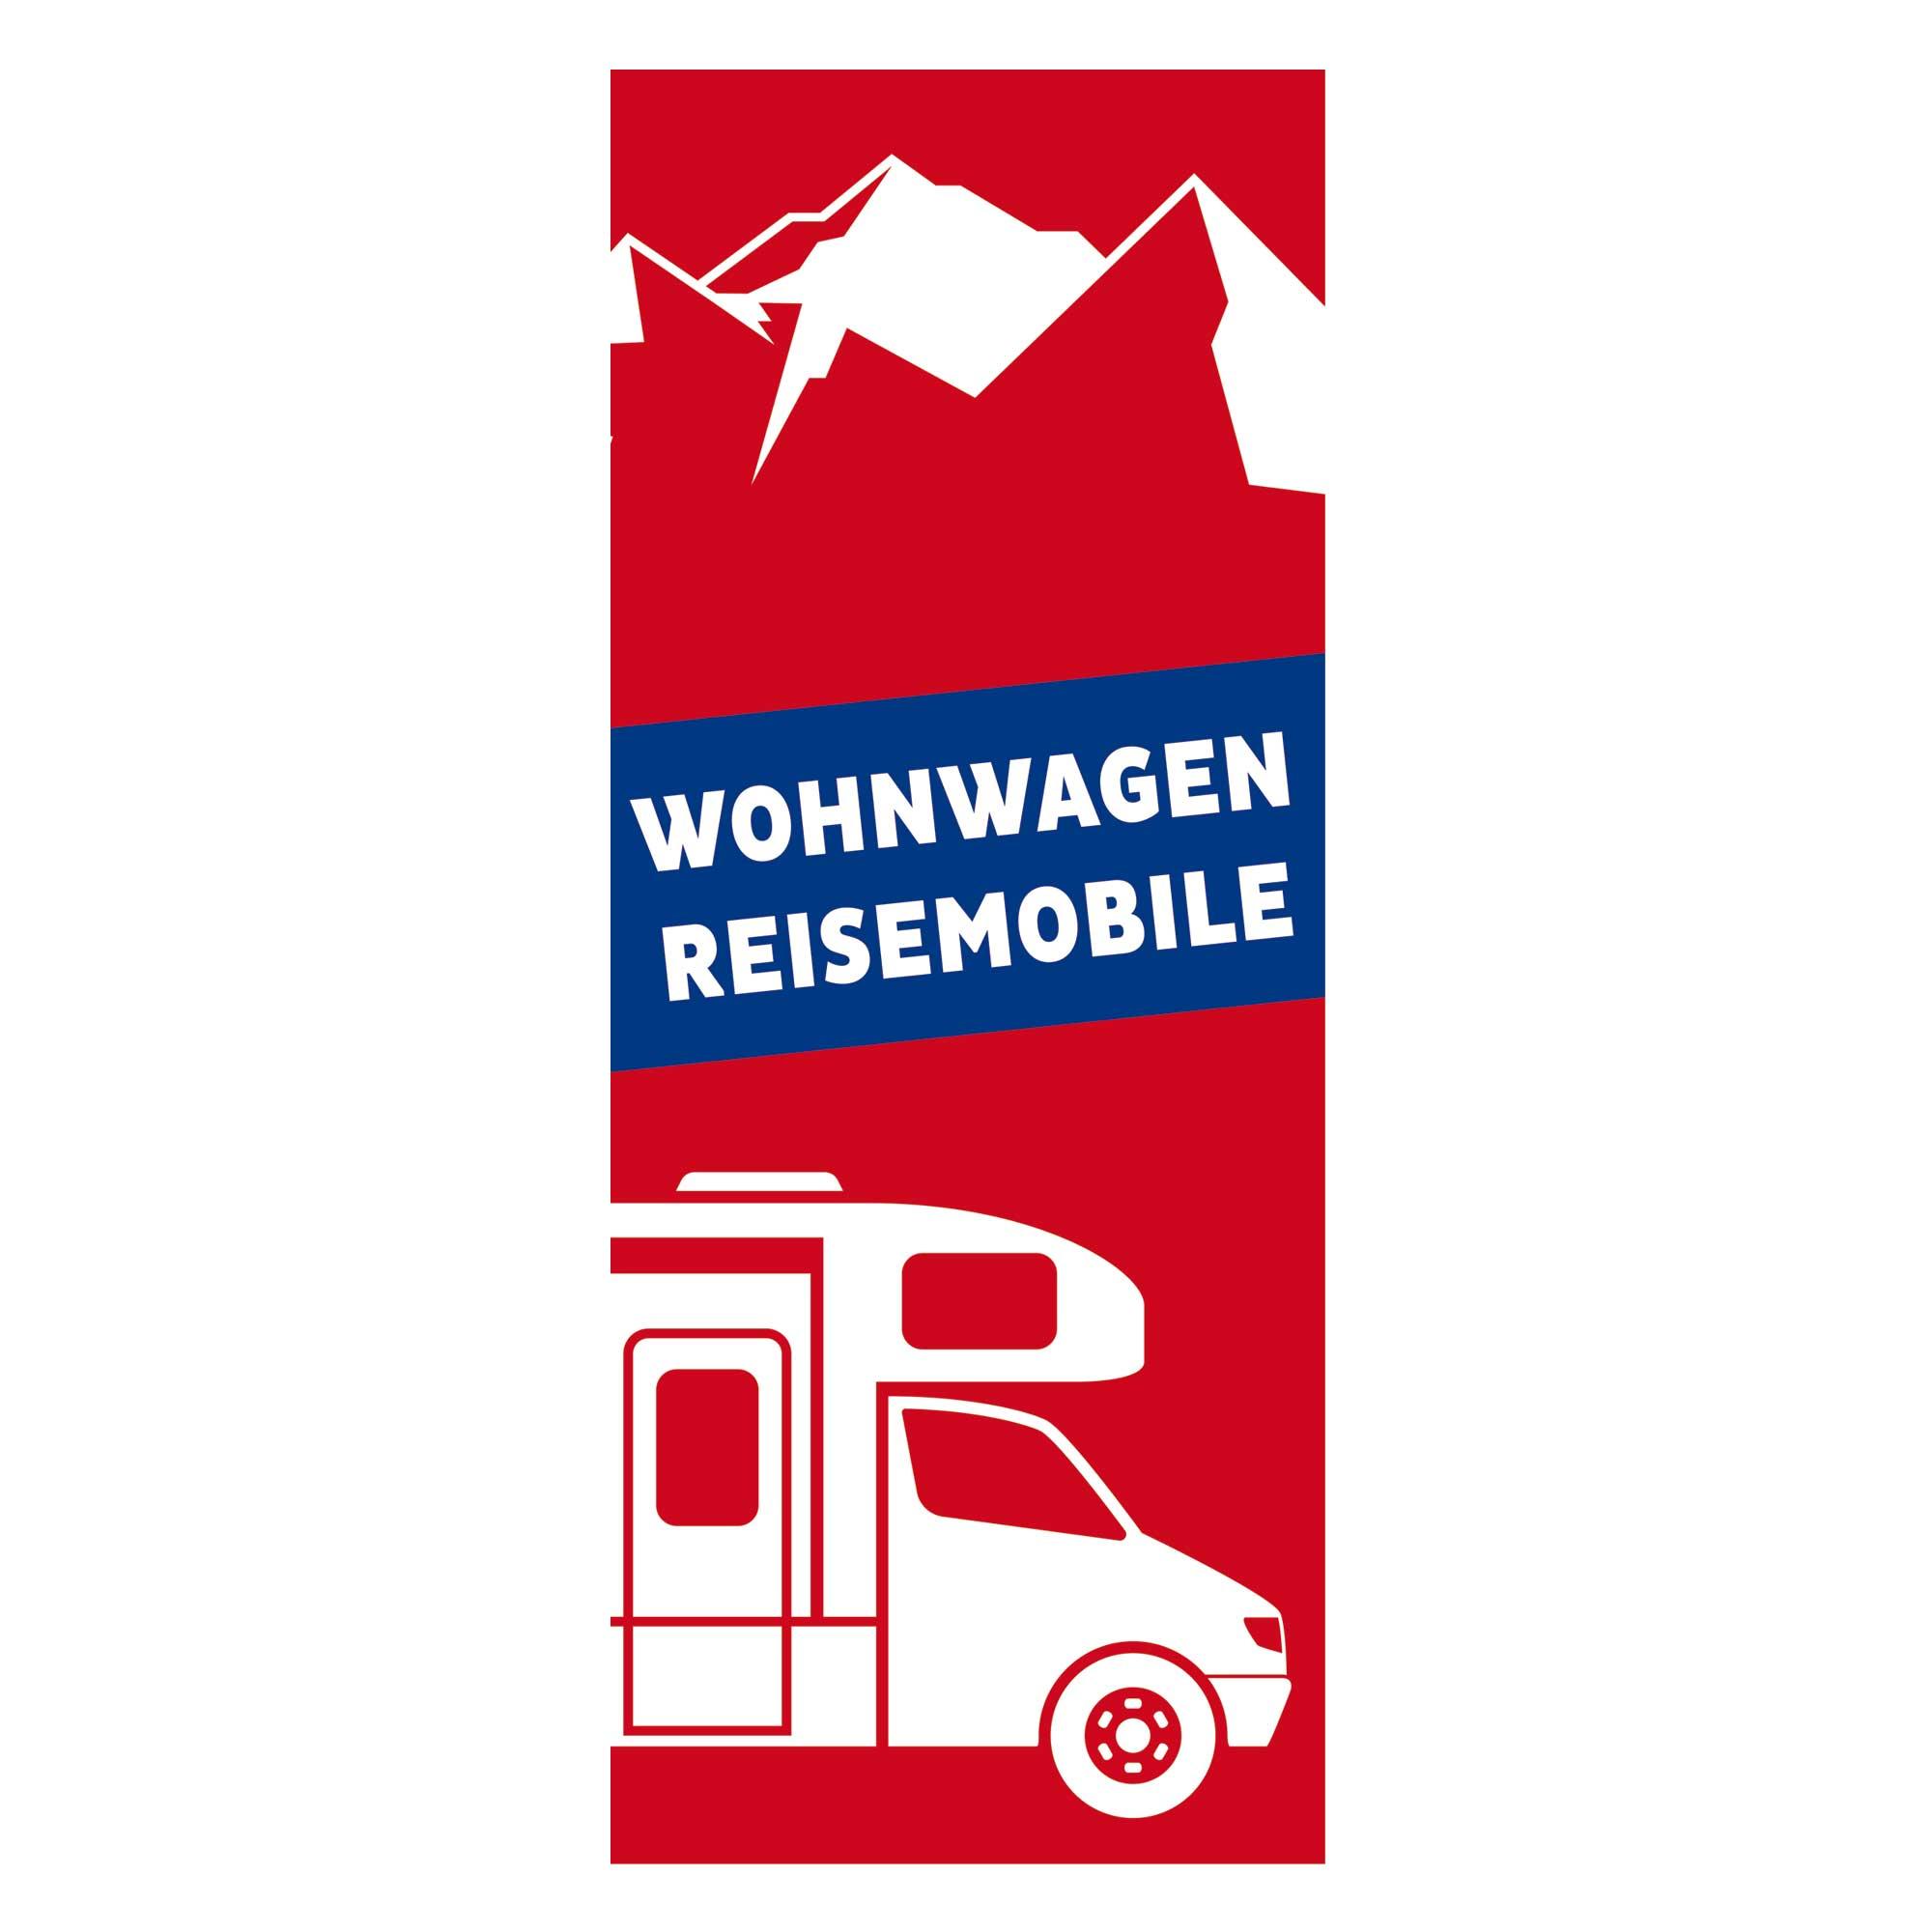 Fahne Wohnwagen & Reisemobile rot/blau